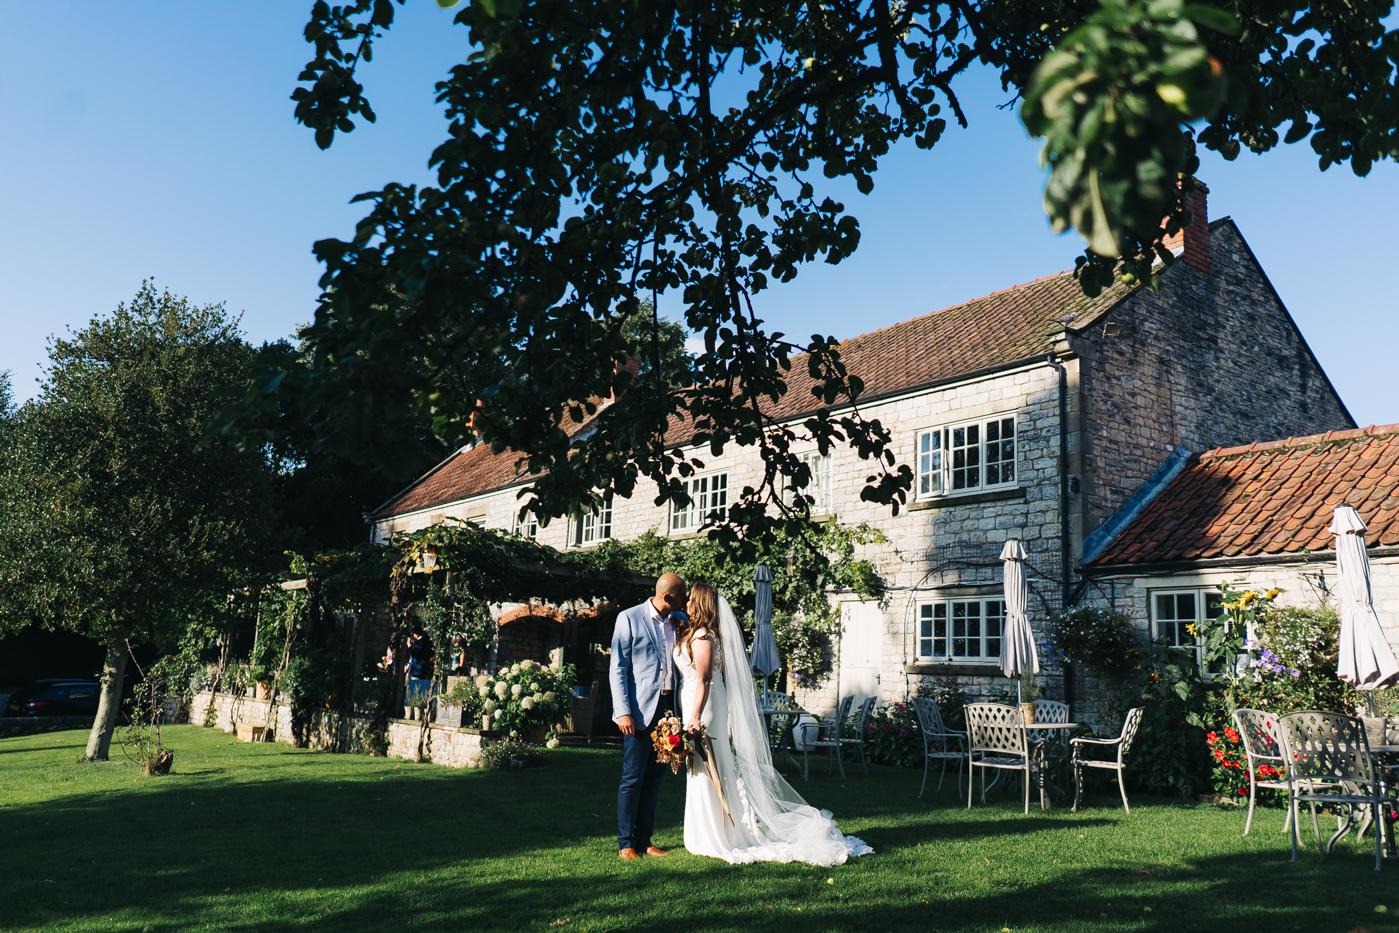 wedding-at-the-pheasant-harome-helmsley-north-yorkshire-wedding-photographer-0035.jpg